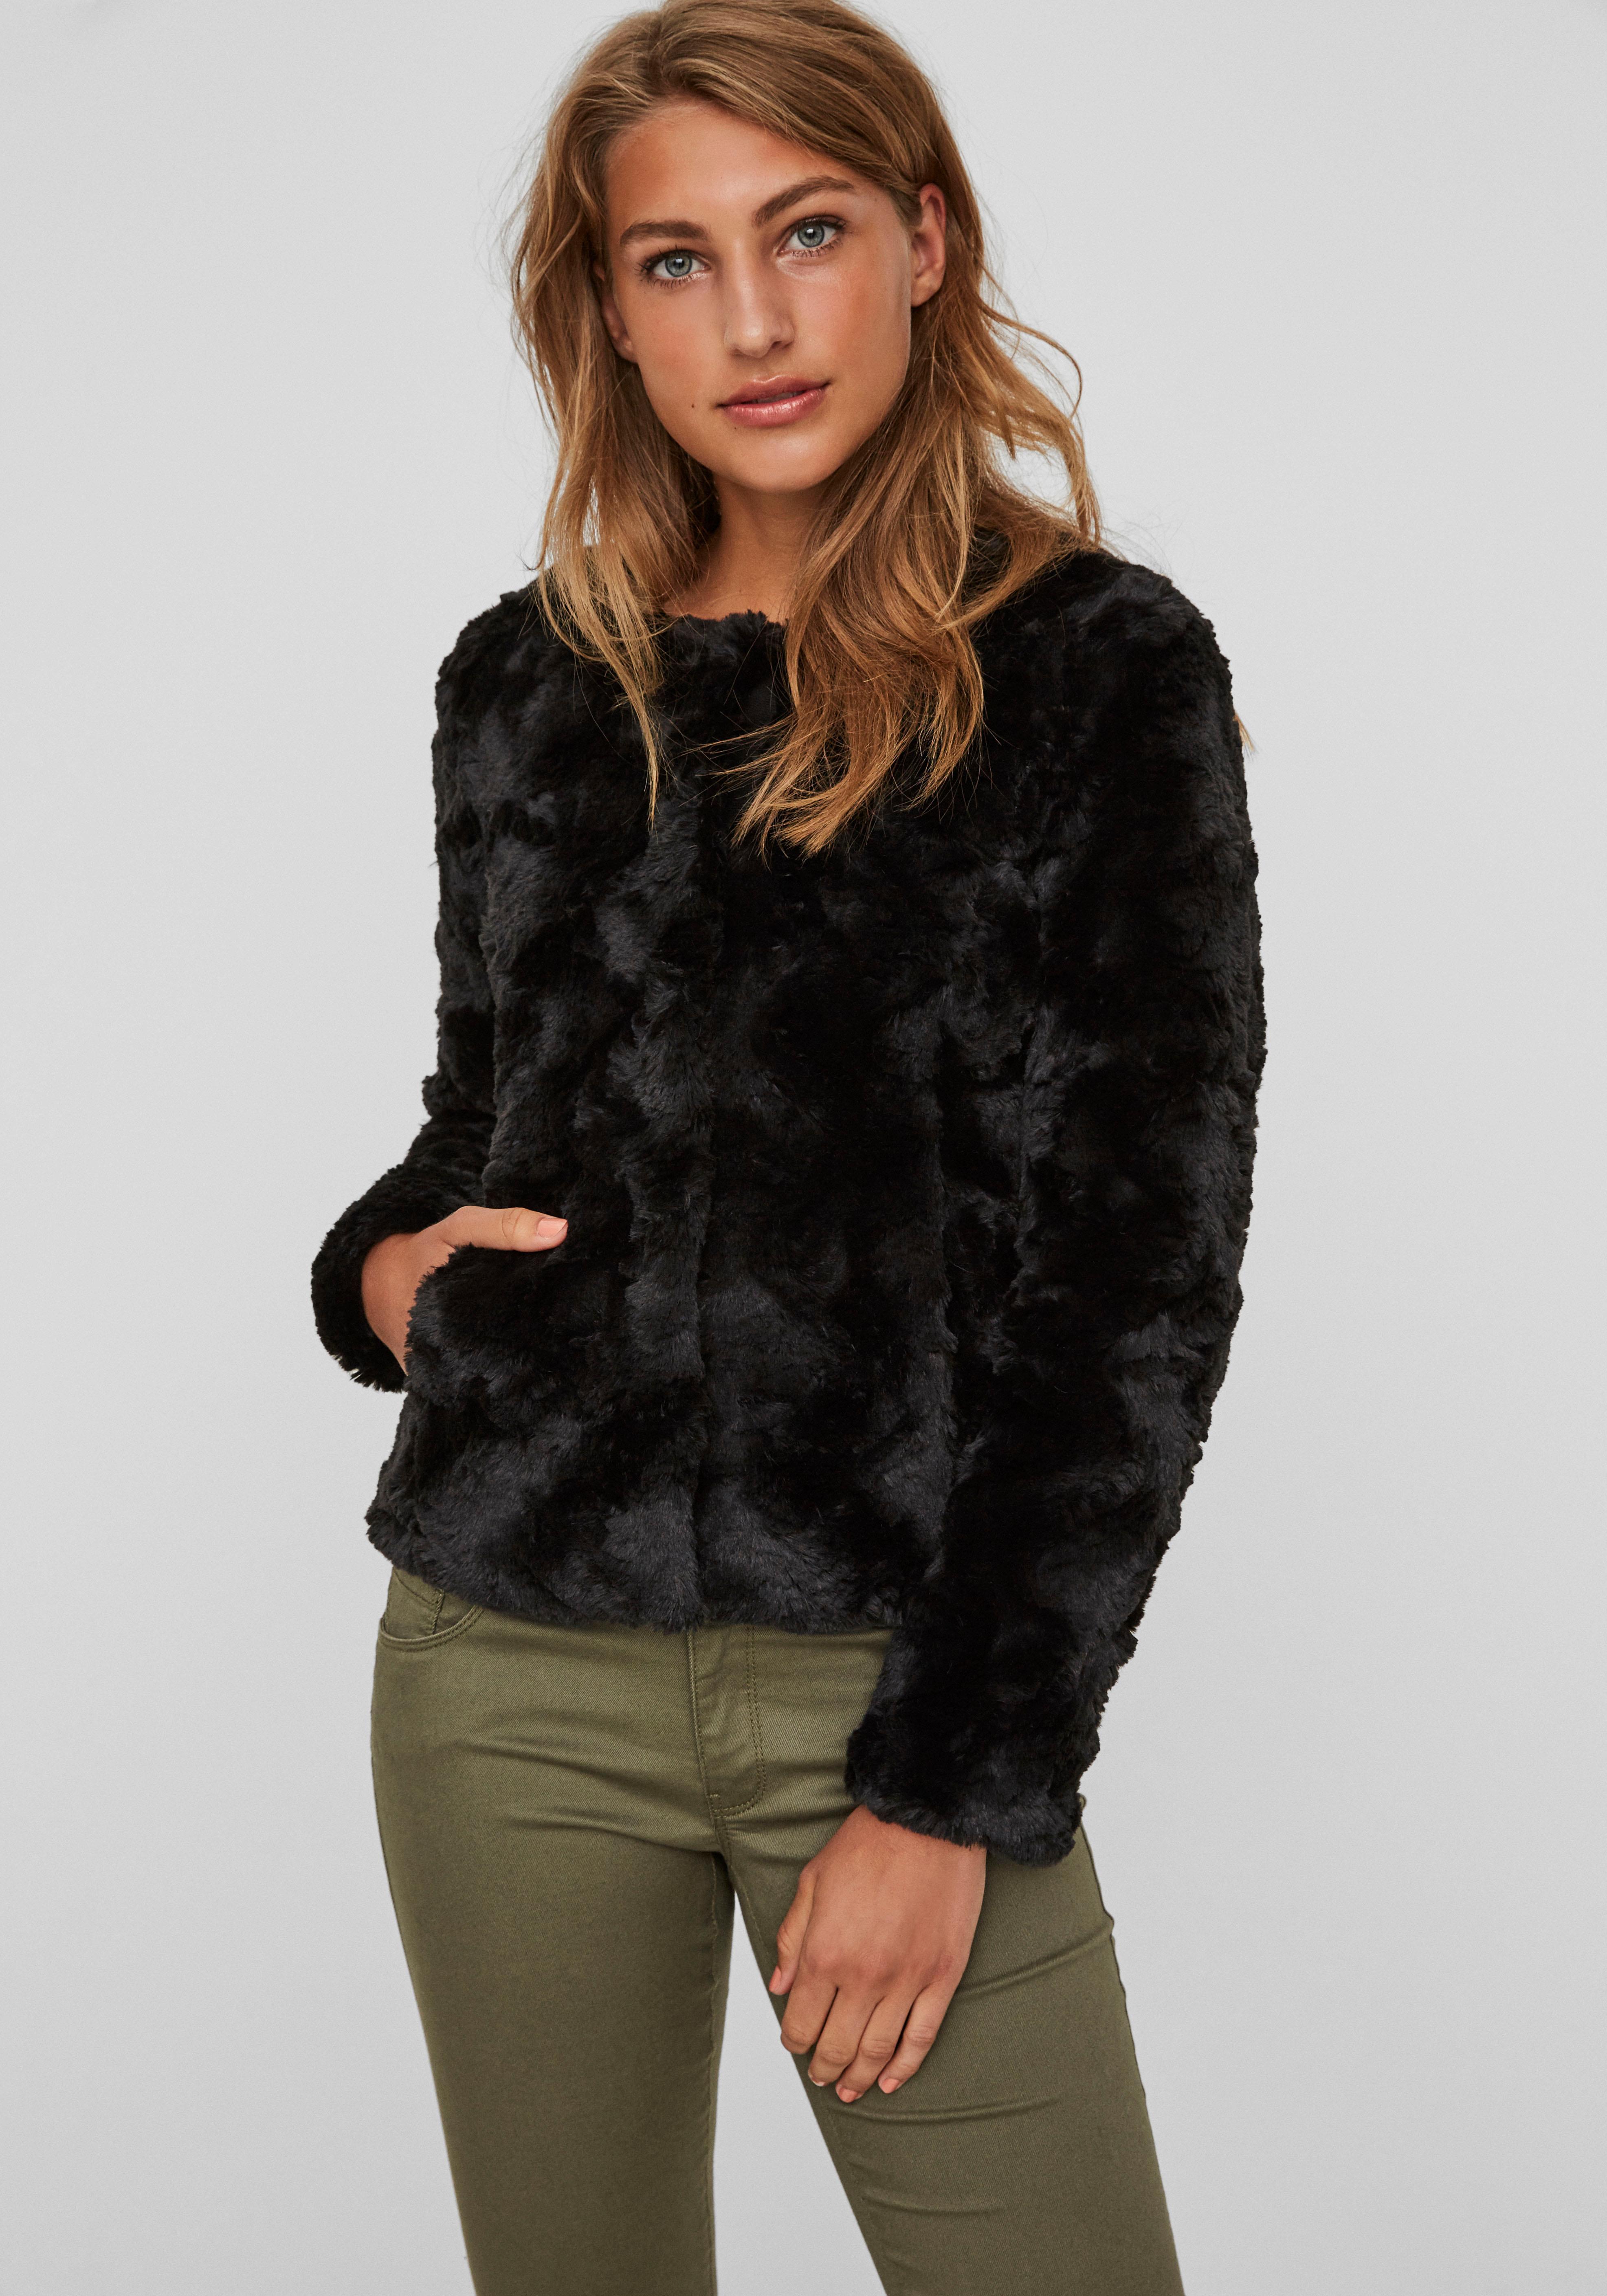 Vero Moda Fellimitatjacke CURL | Bekleidung > Jacken > Fellimitatjacken | Schwarz | Vero Moda